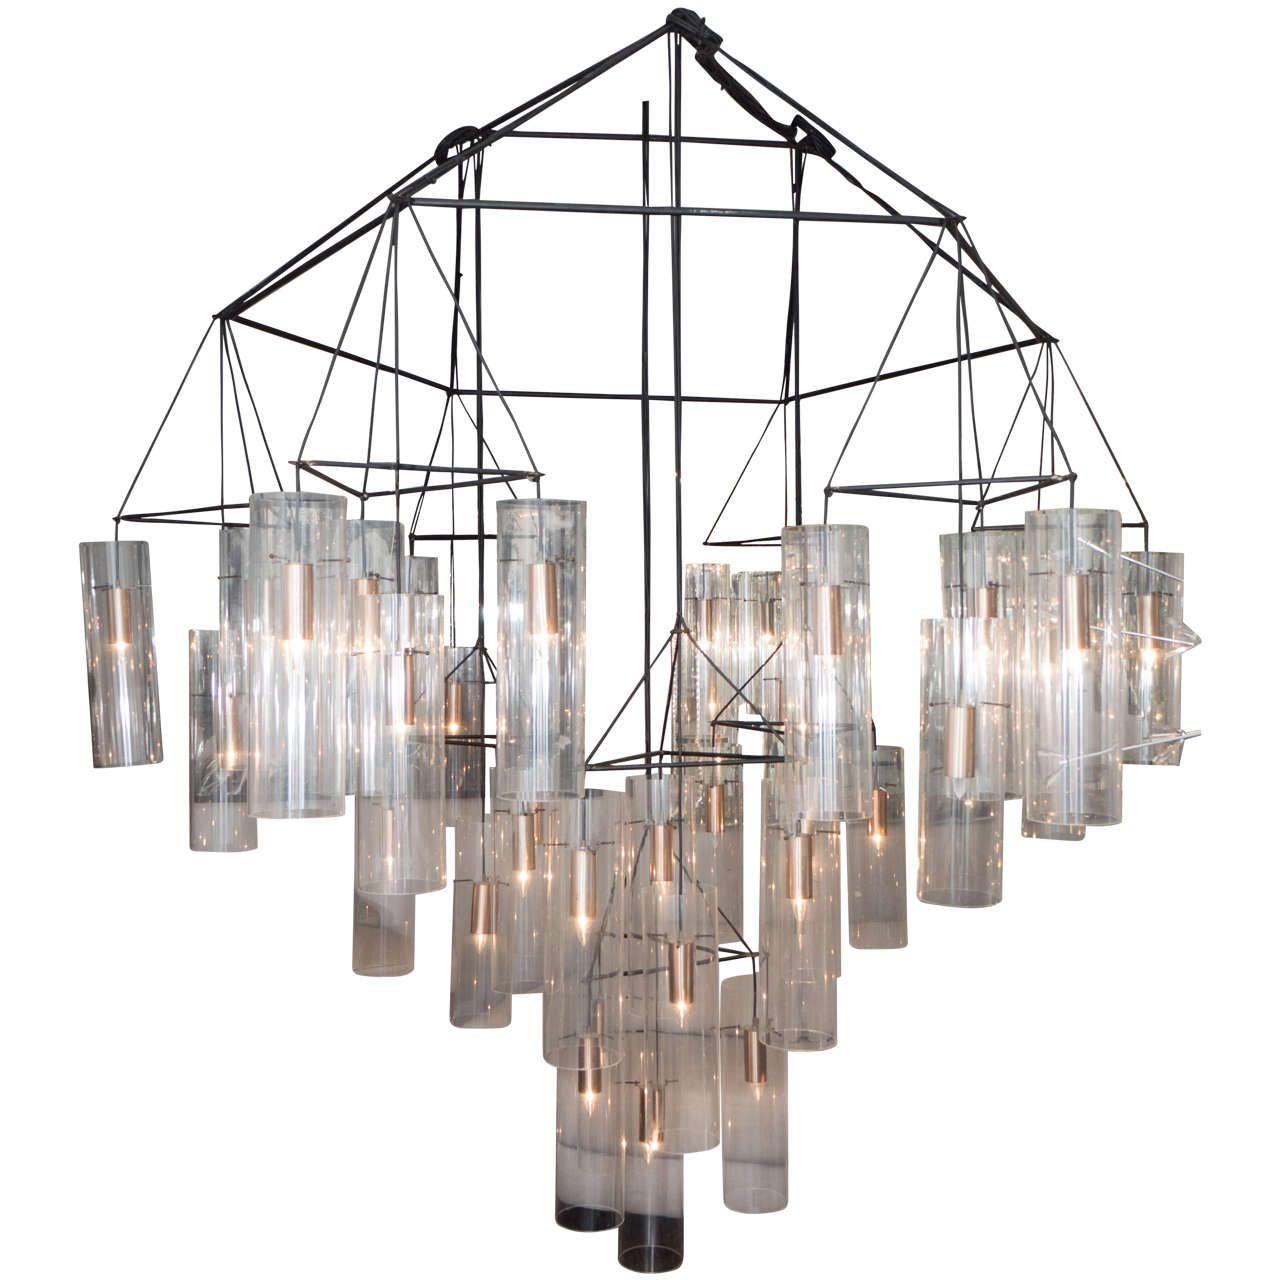 Huge custom style aartreme chandelier pendant lighting